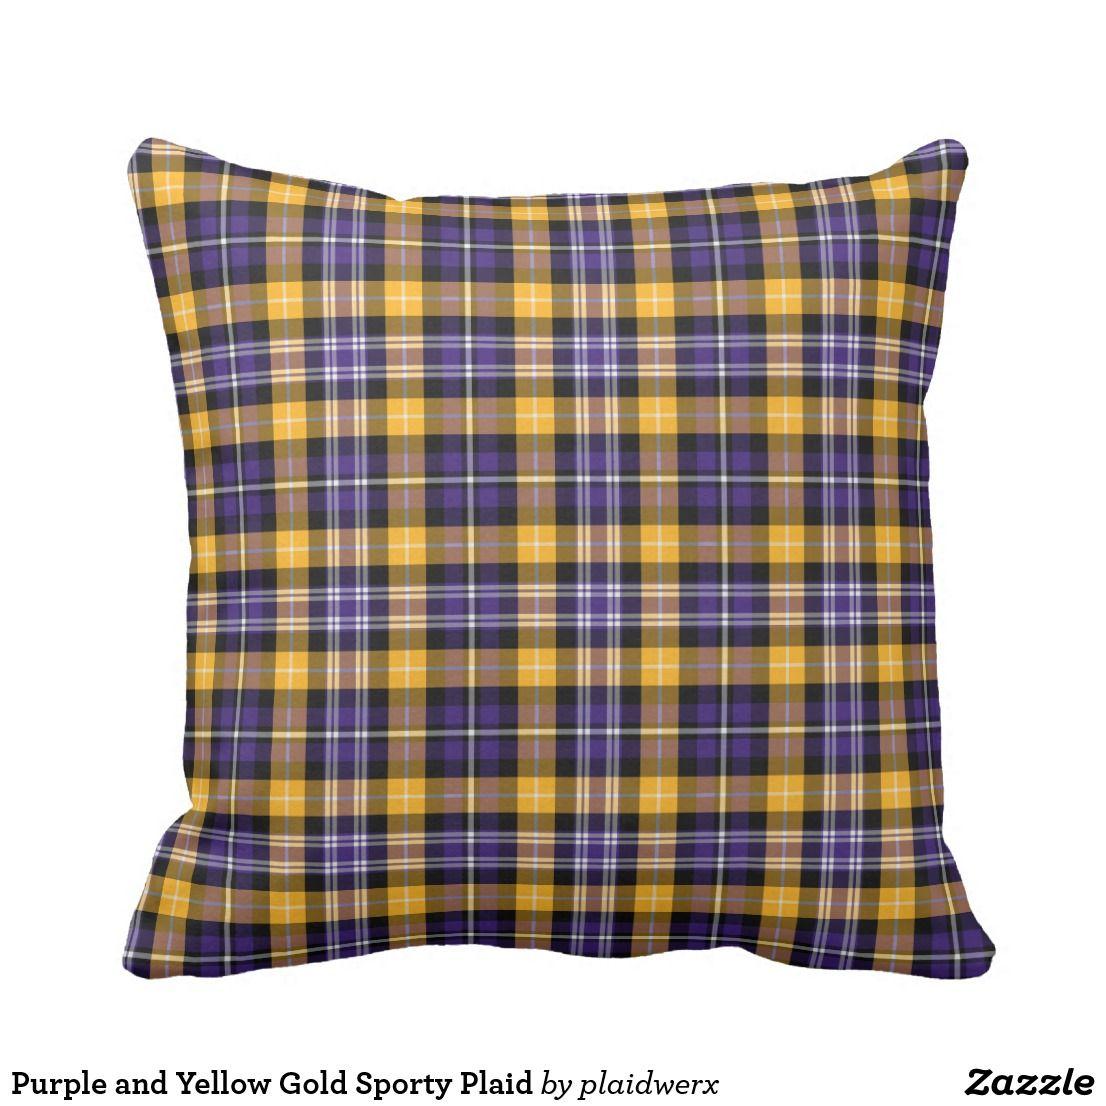 Purple And Yellow Gold Sporty Plaid Throw Pillow A Plaidwerx Original Tartan Design With Por School Colors Schoolcolors